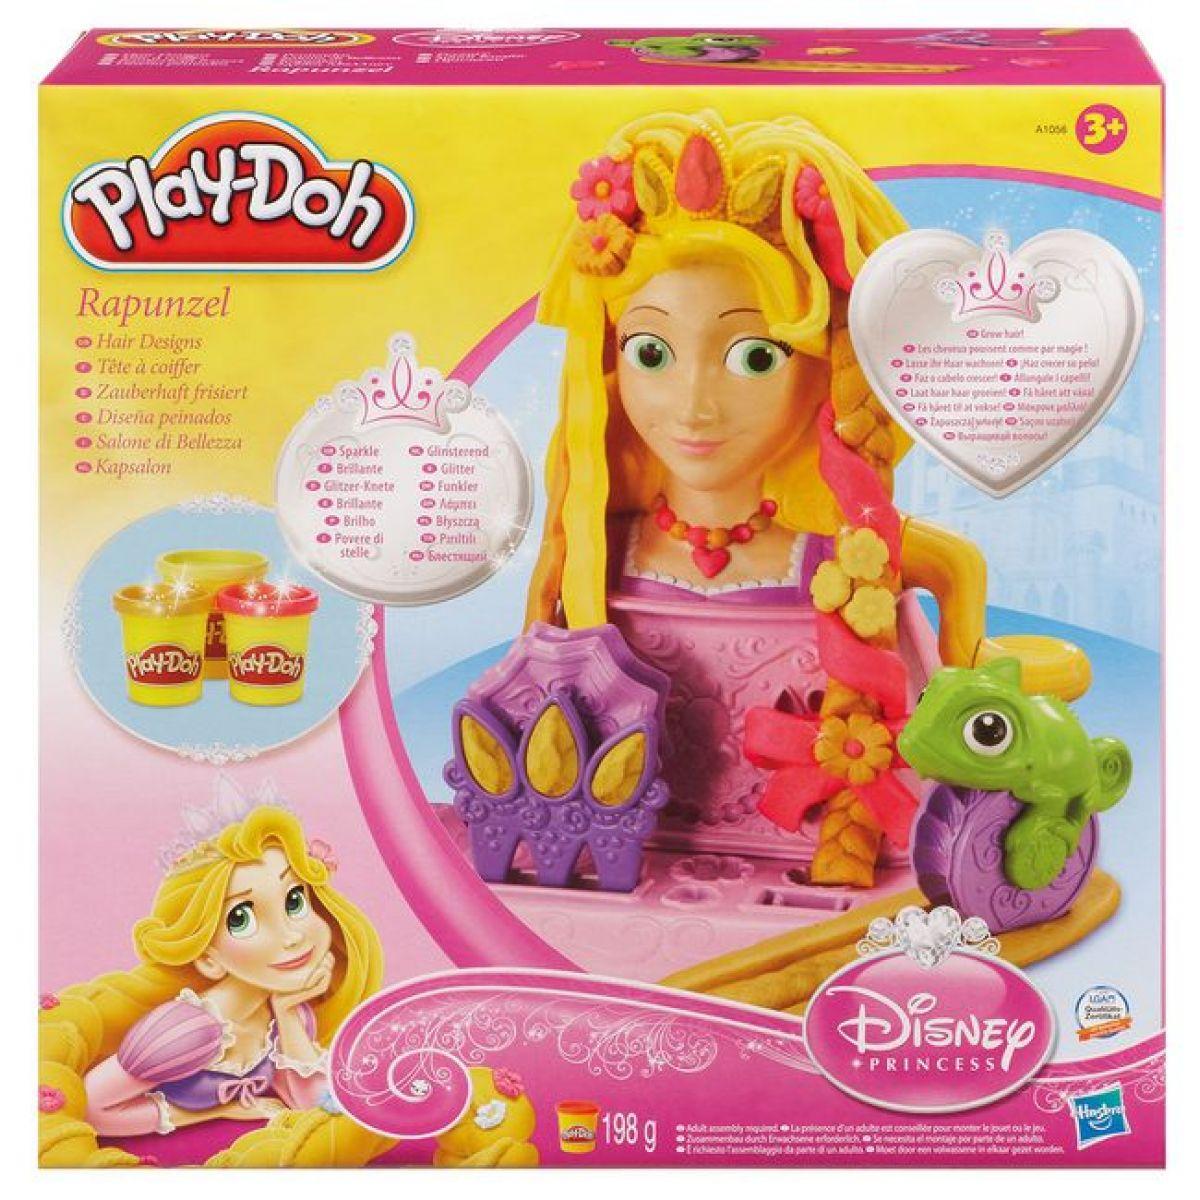 Hasbro A1056 - Play-Doh Disney Princes Locika vlasové studio